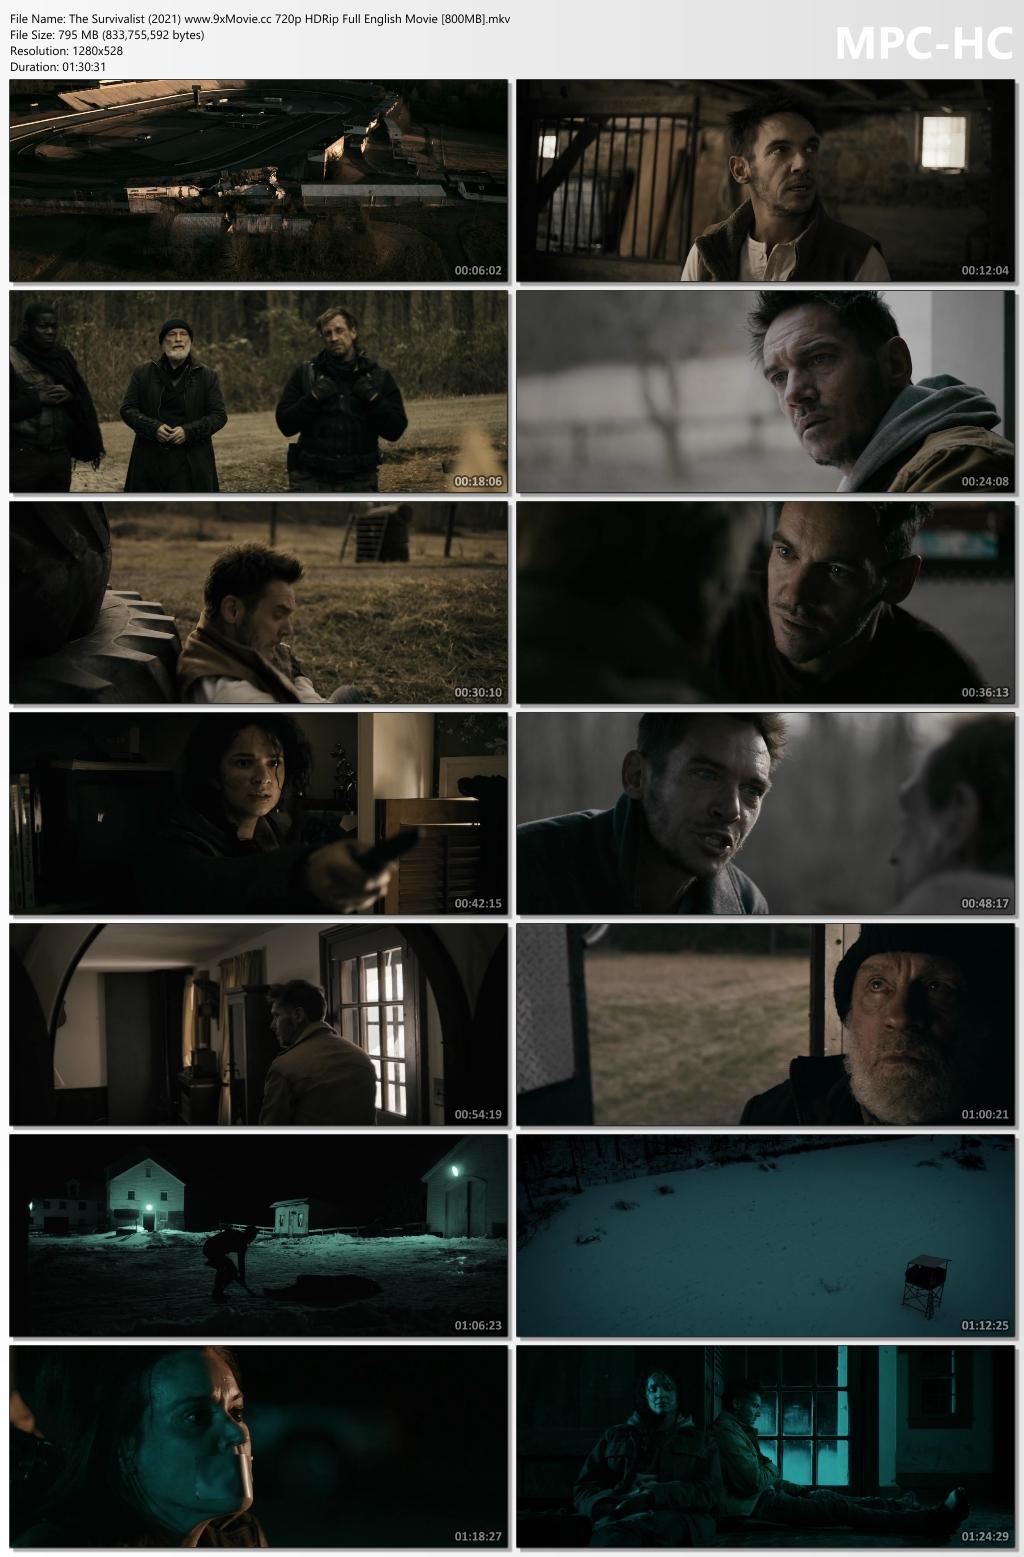 The-Survivalist-2021-www-9x-Movie-cc-720p-HDRip-Full-English-Movie-800-MB-mkv